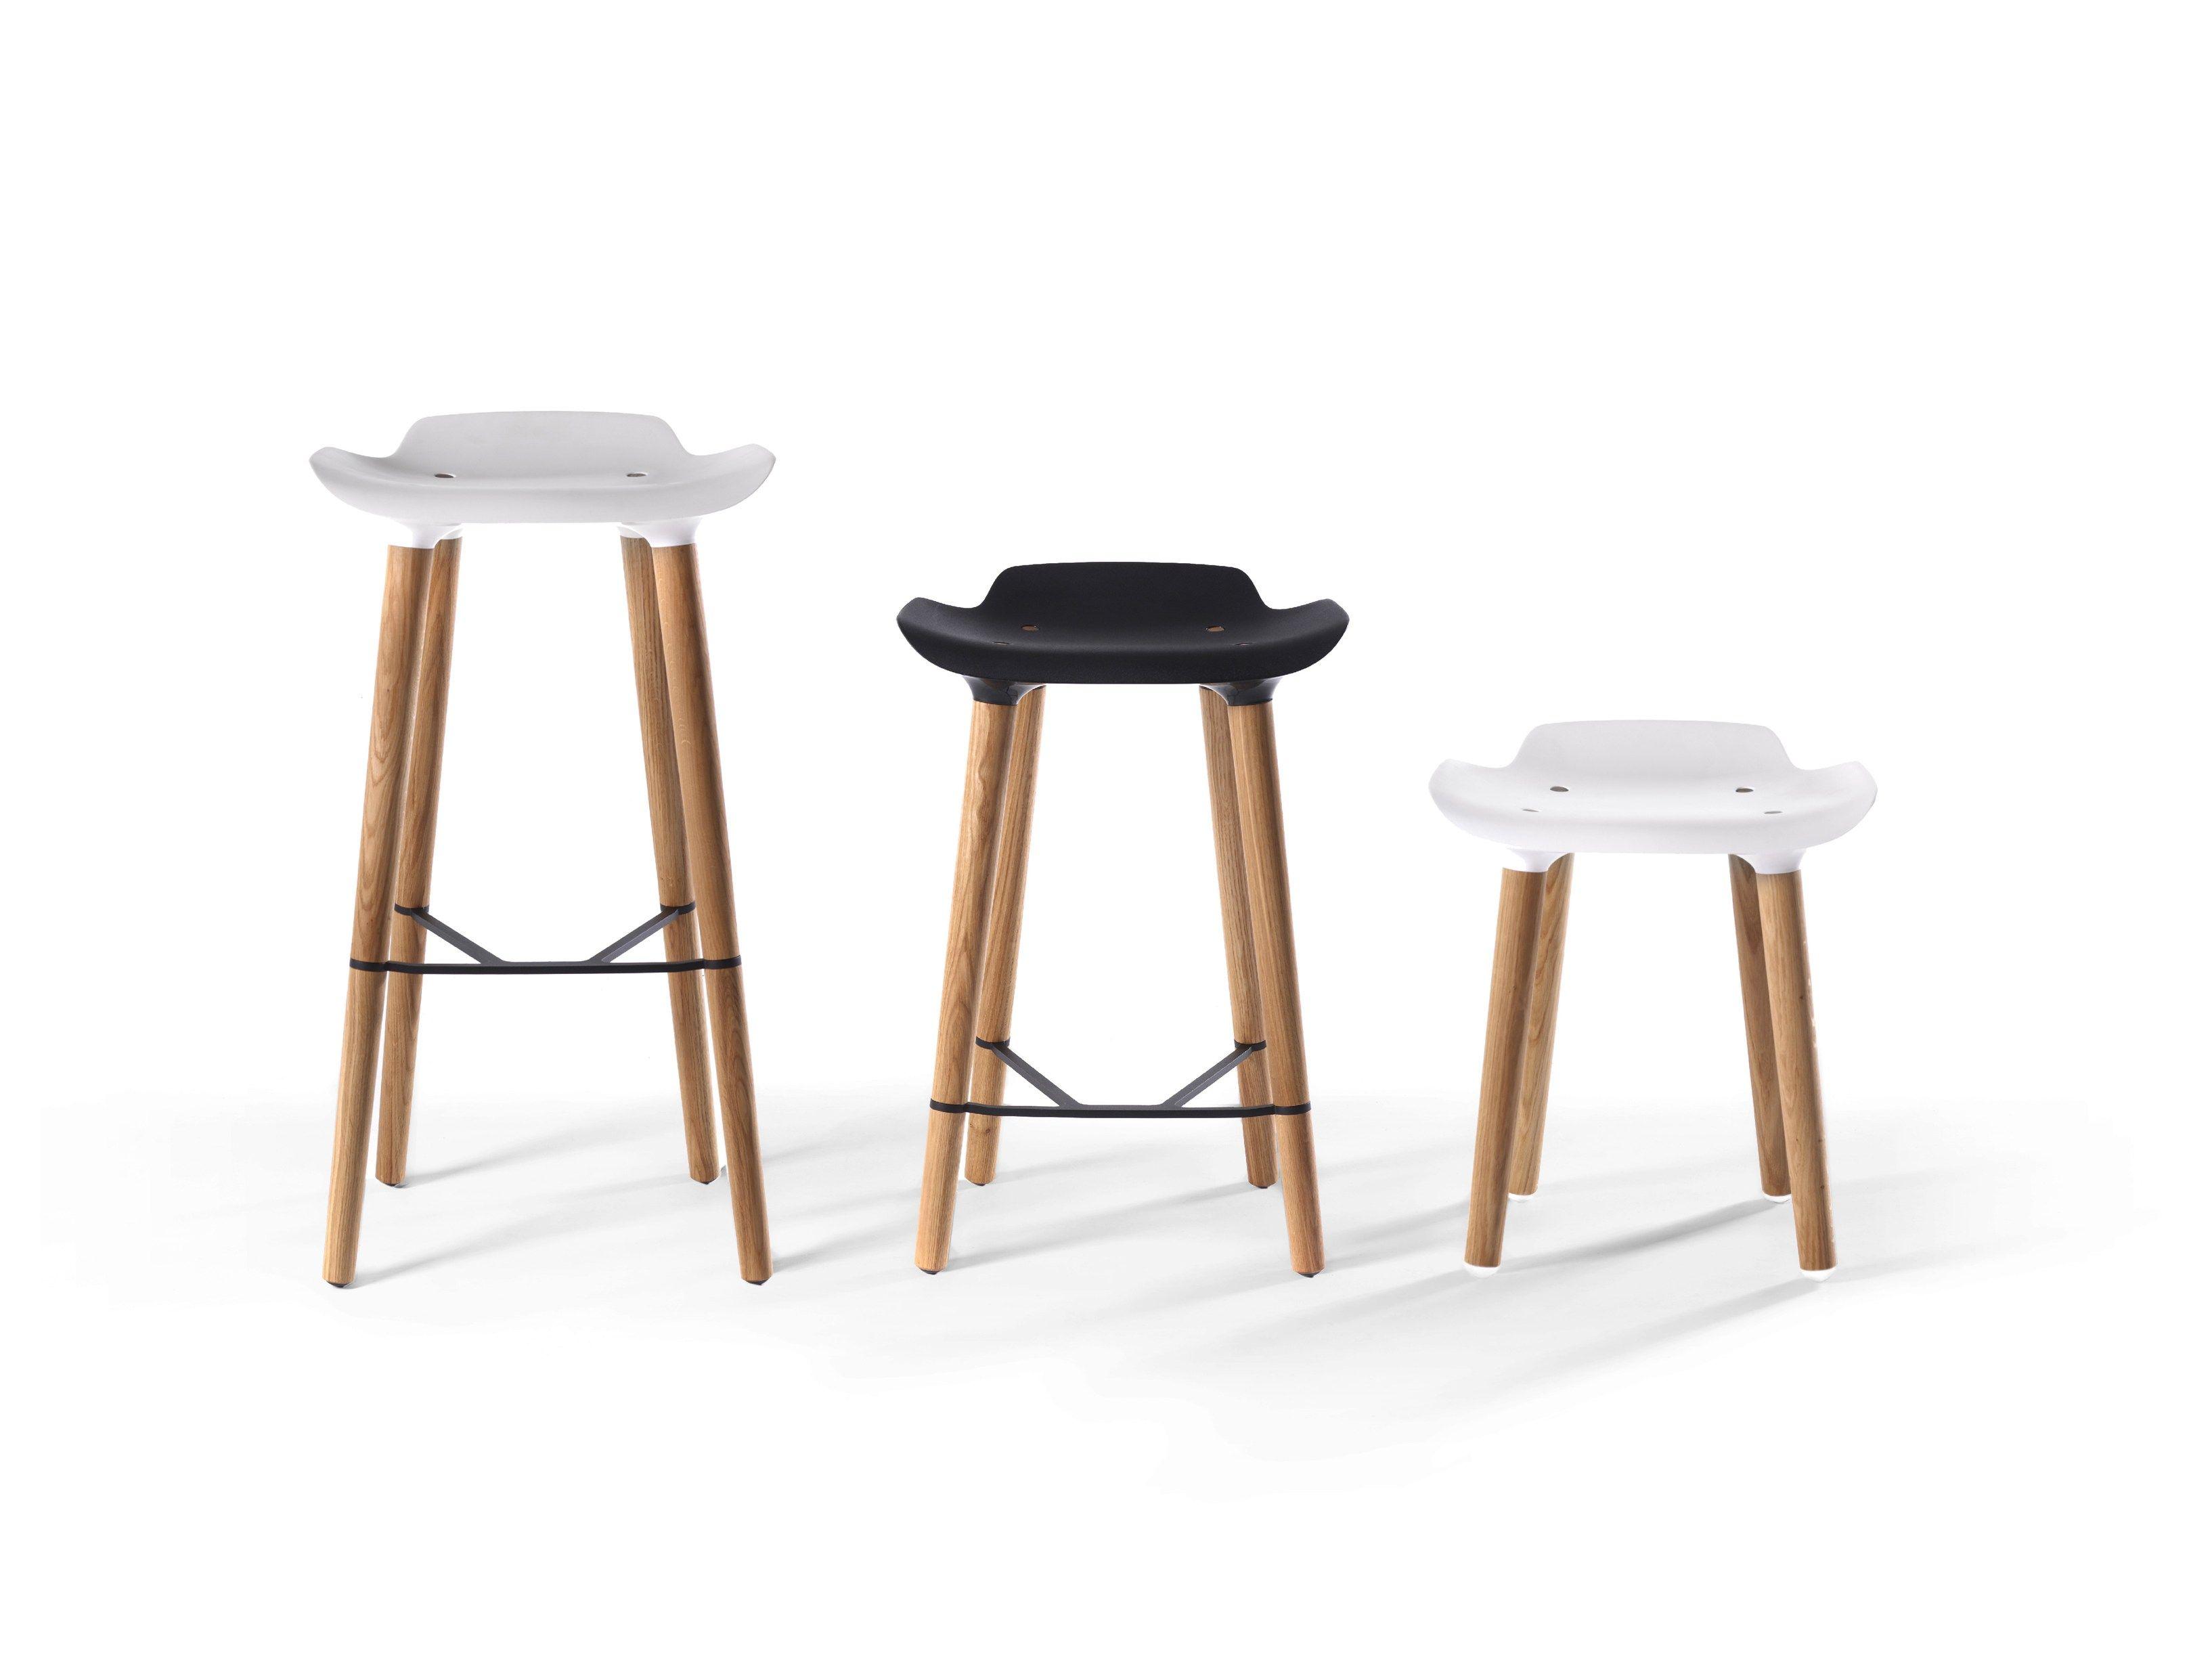 Wooden Stool Pilot Kitchen Stool By Quinze & Milan Design